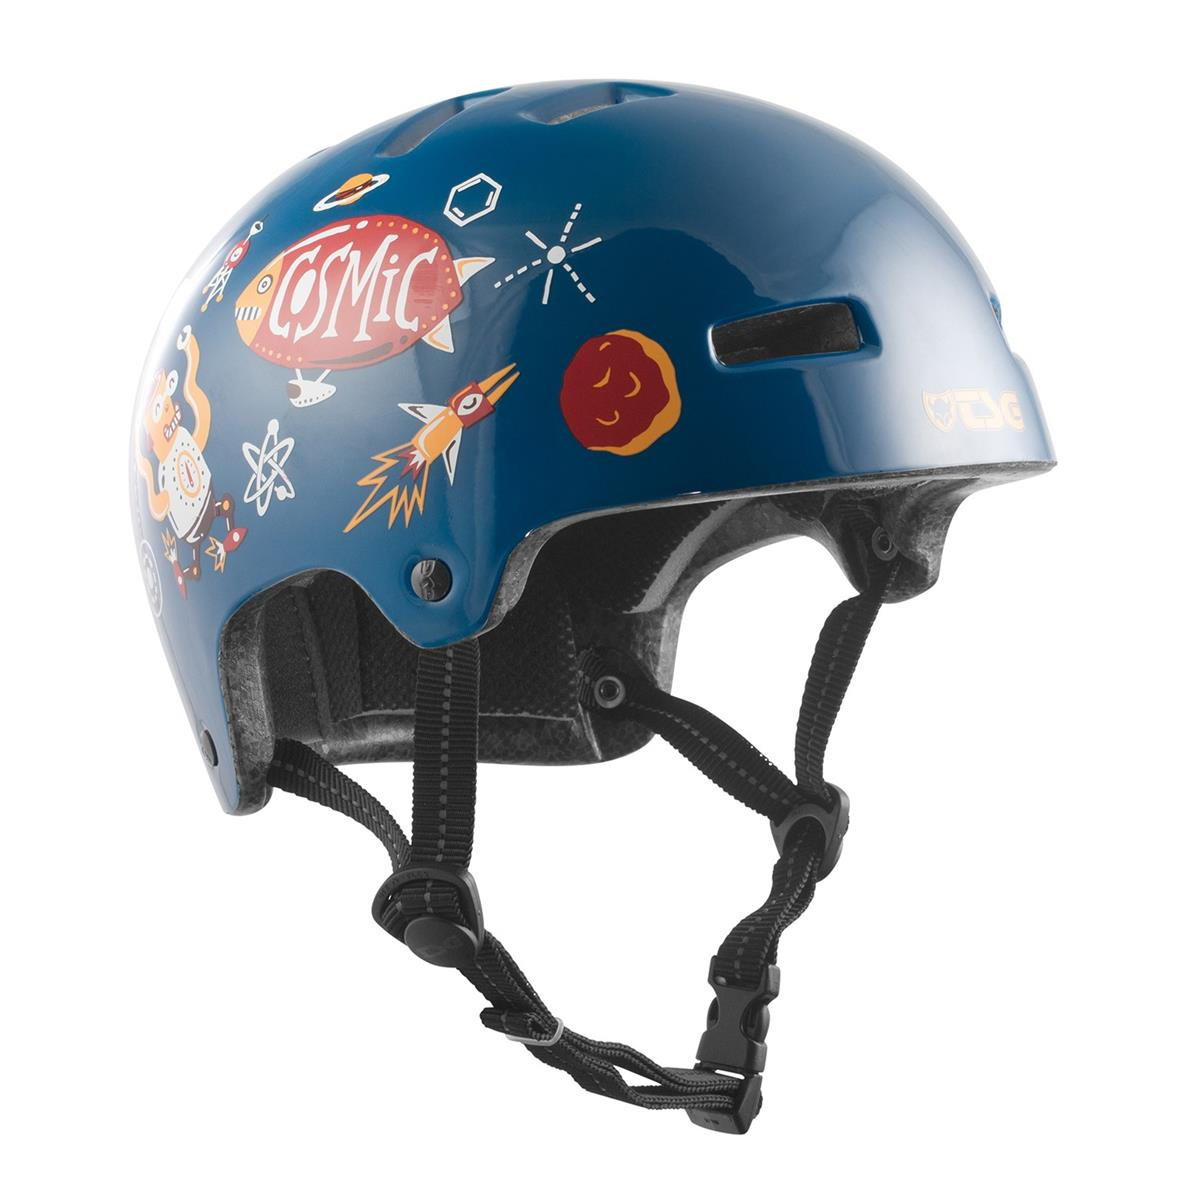 TSG Kids BMX/Dirt Helm Nipper Maxi Graphic Design - Turbo Cosmic